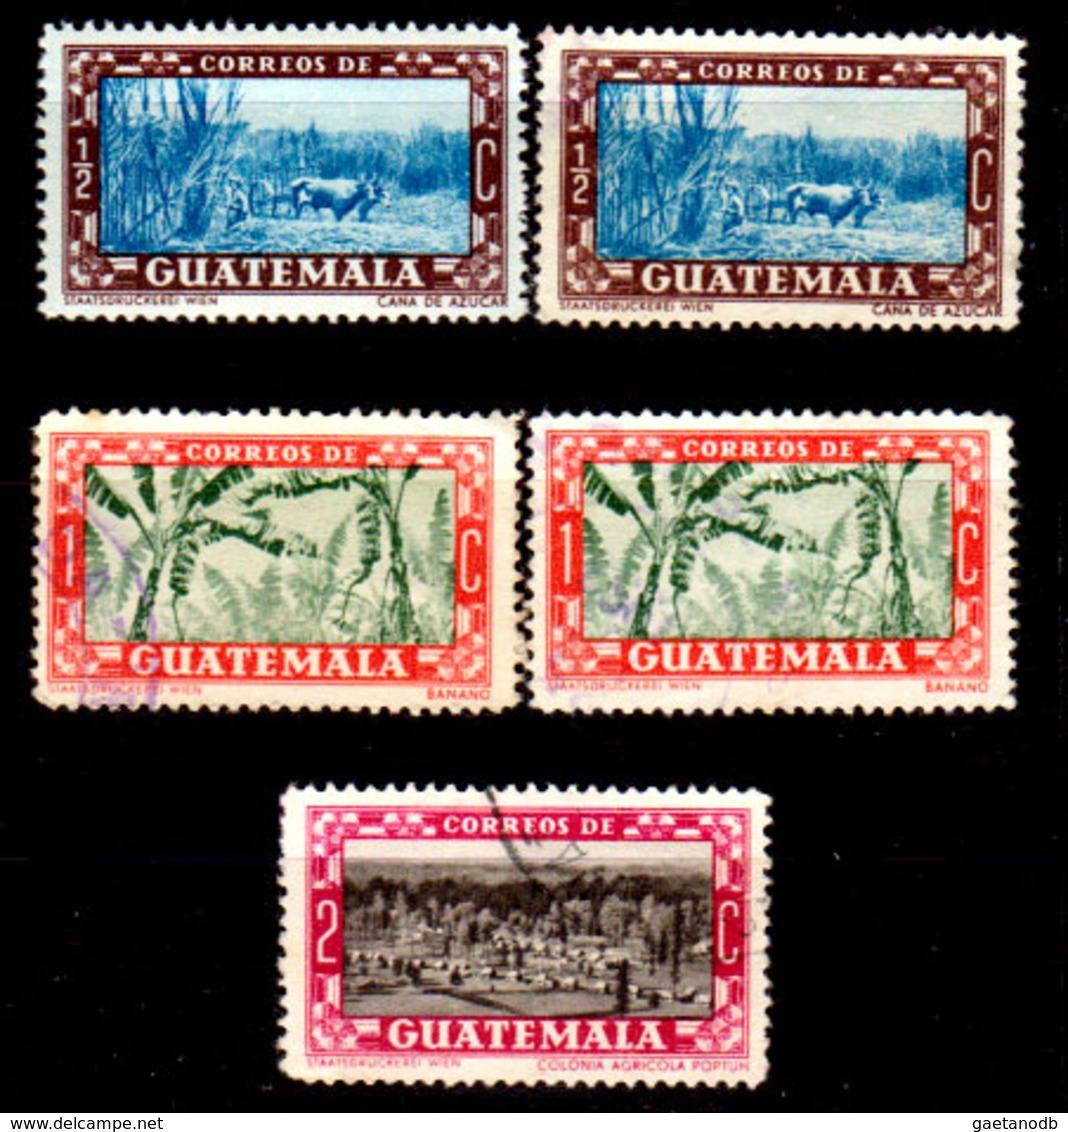 Guatemala-0131 - Emissione 1953 (+/o) LH/Used - - Guatemala